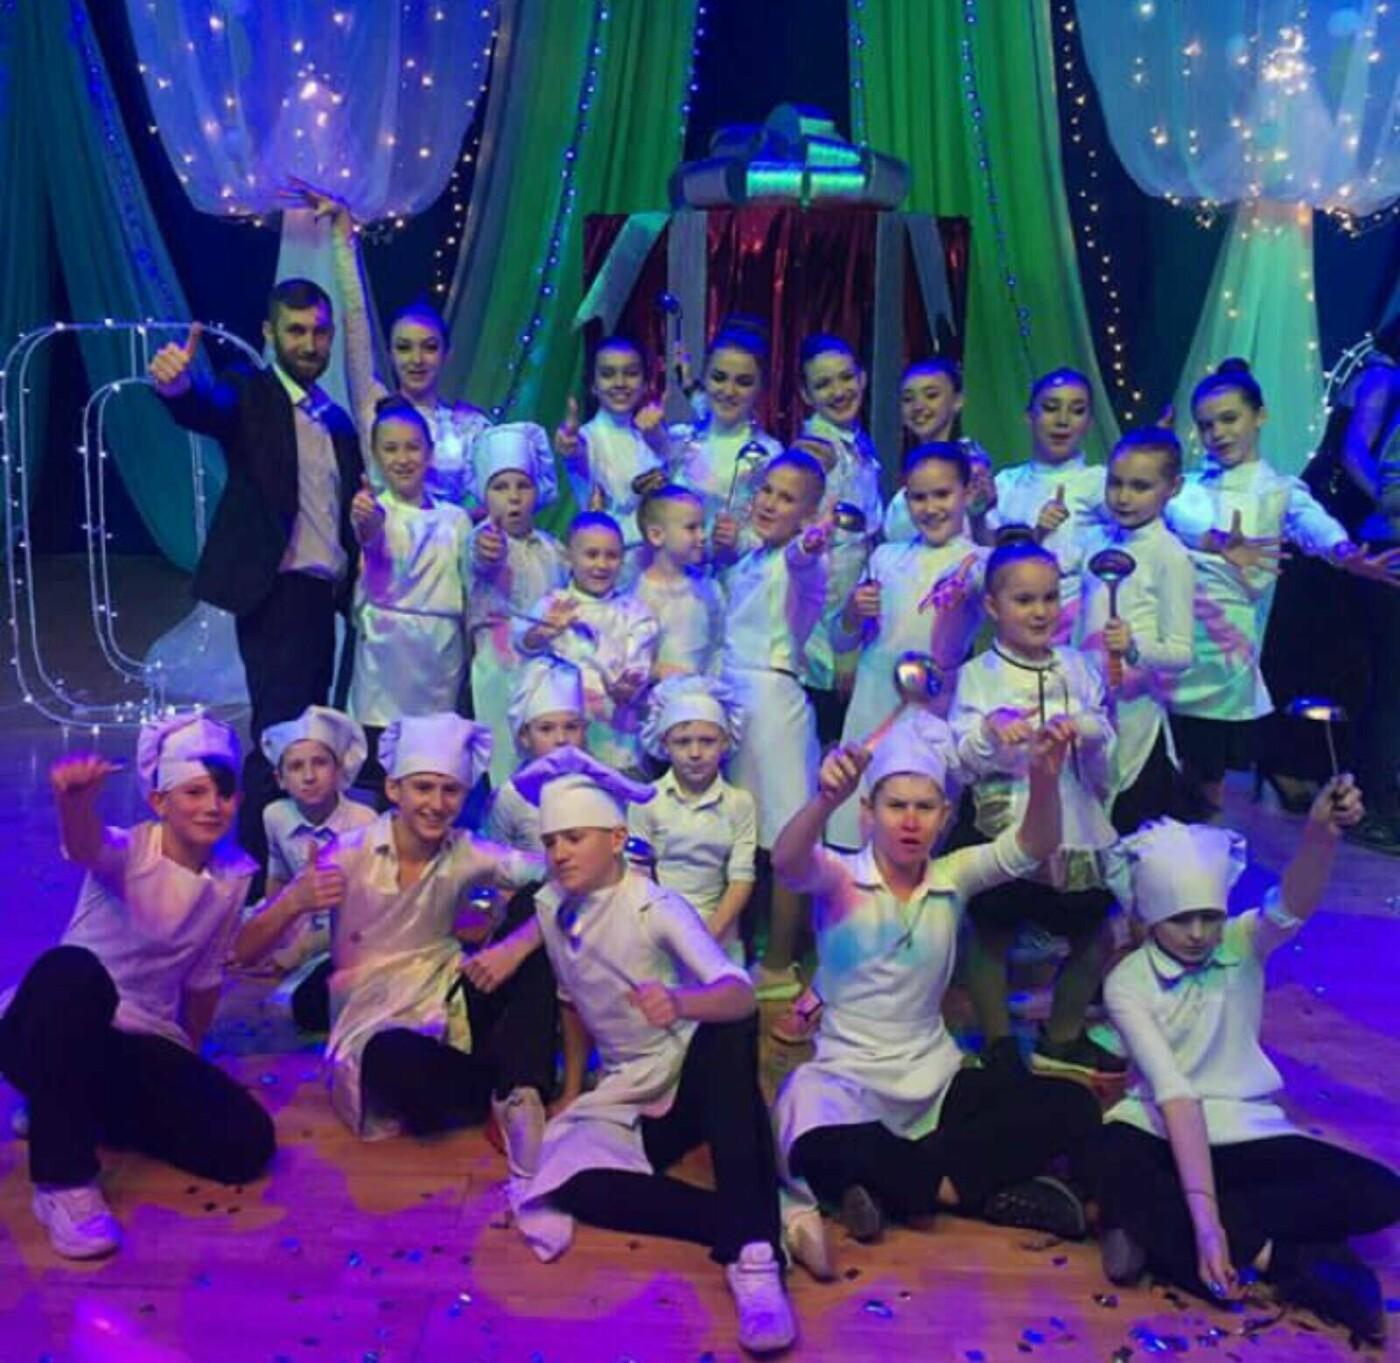 Танцы в Лозовой от А до Я: куда, когда и как?, фото-49